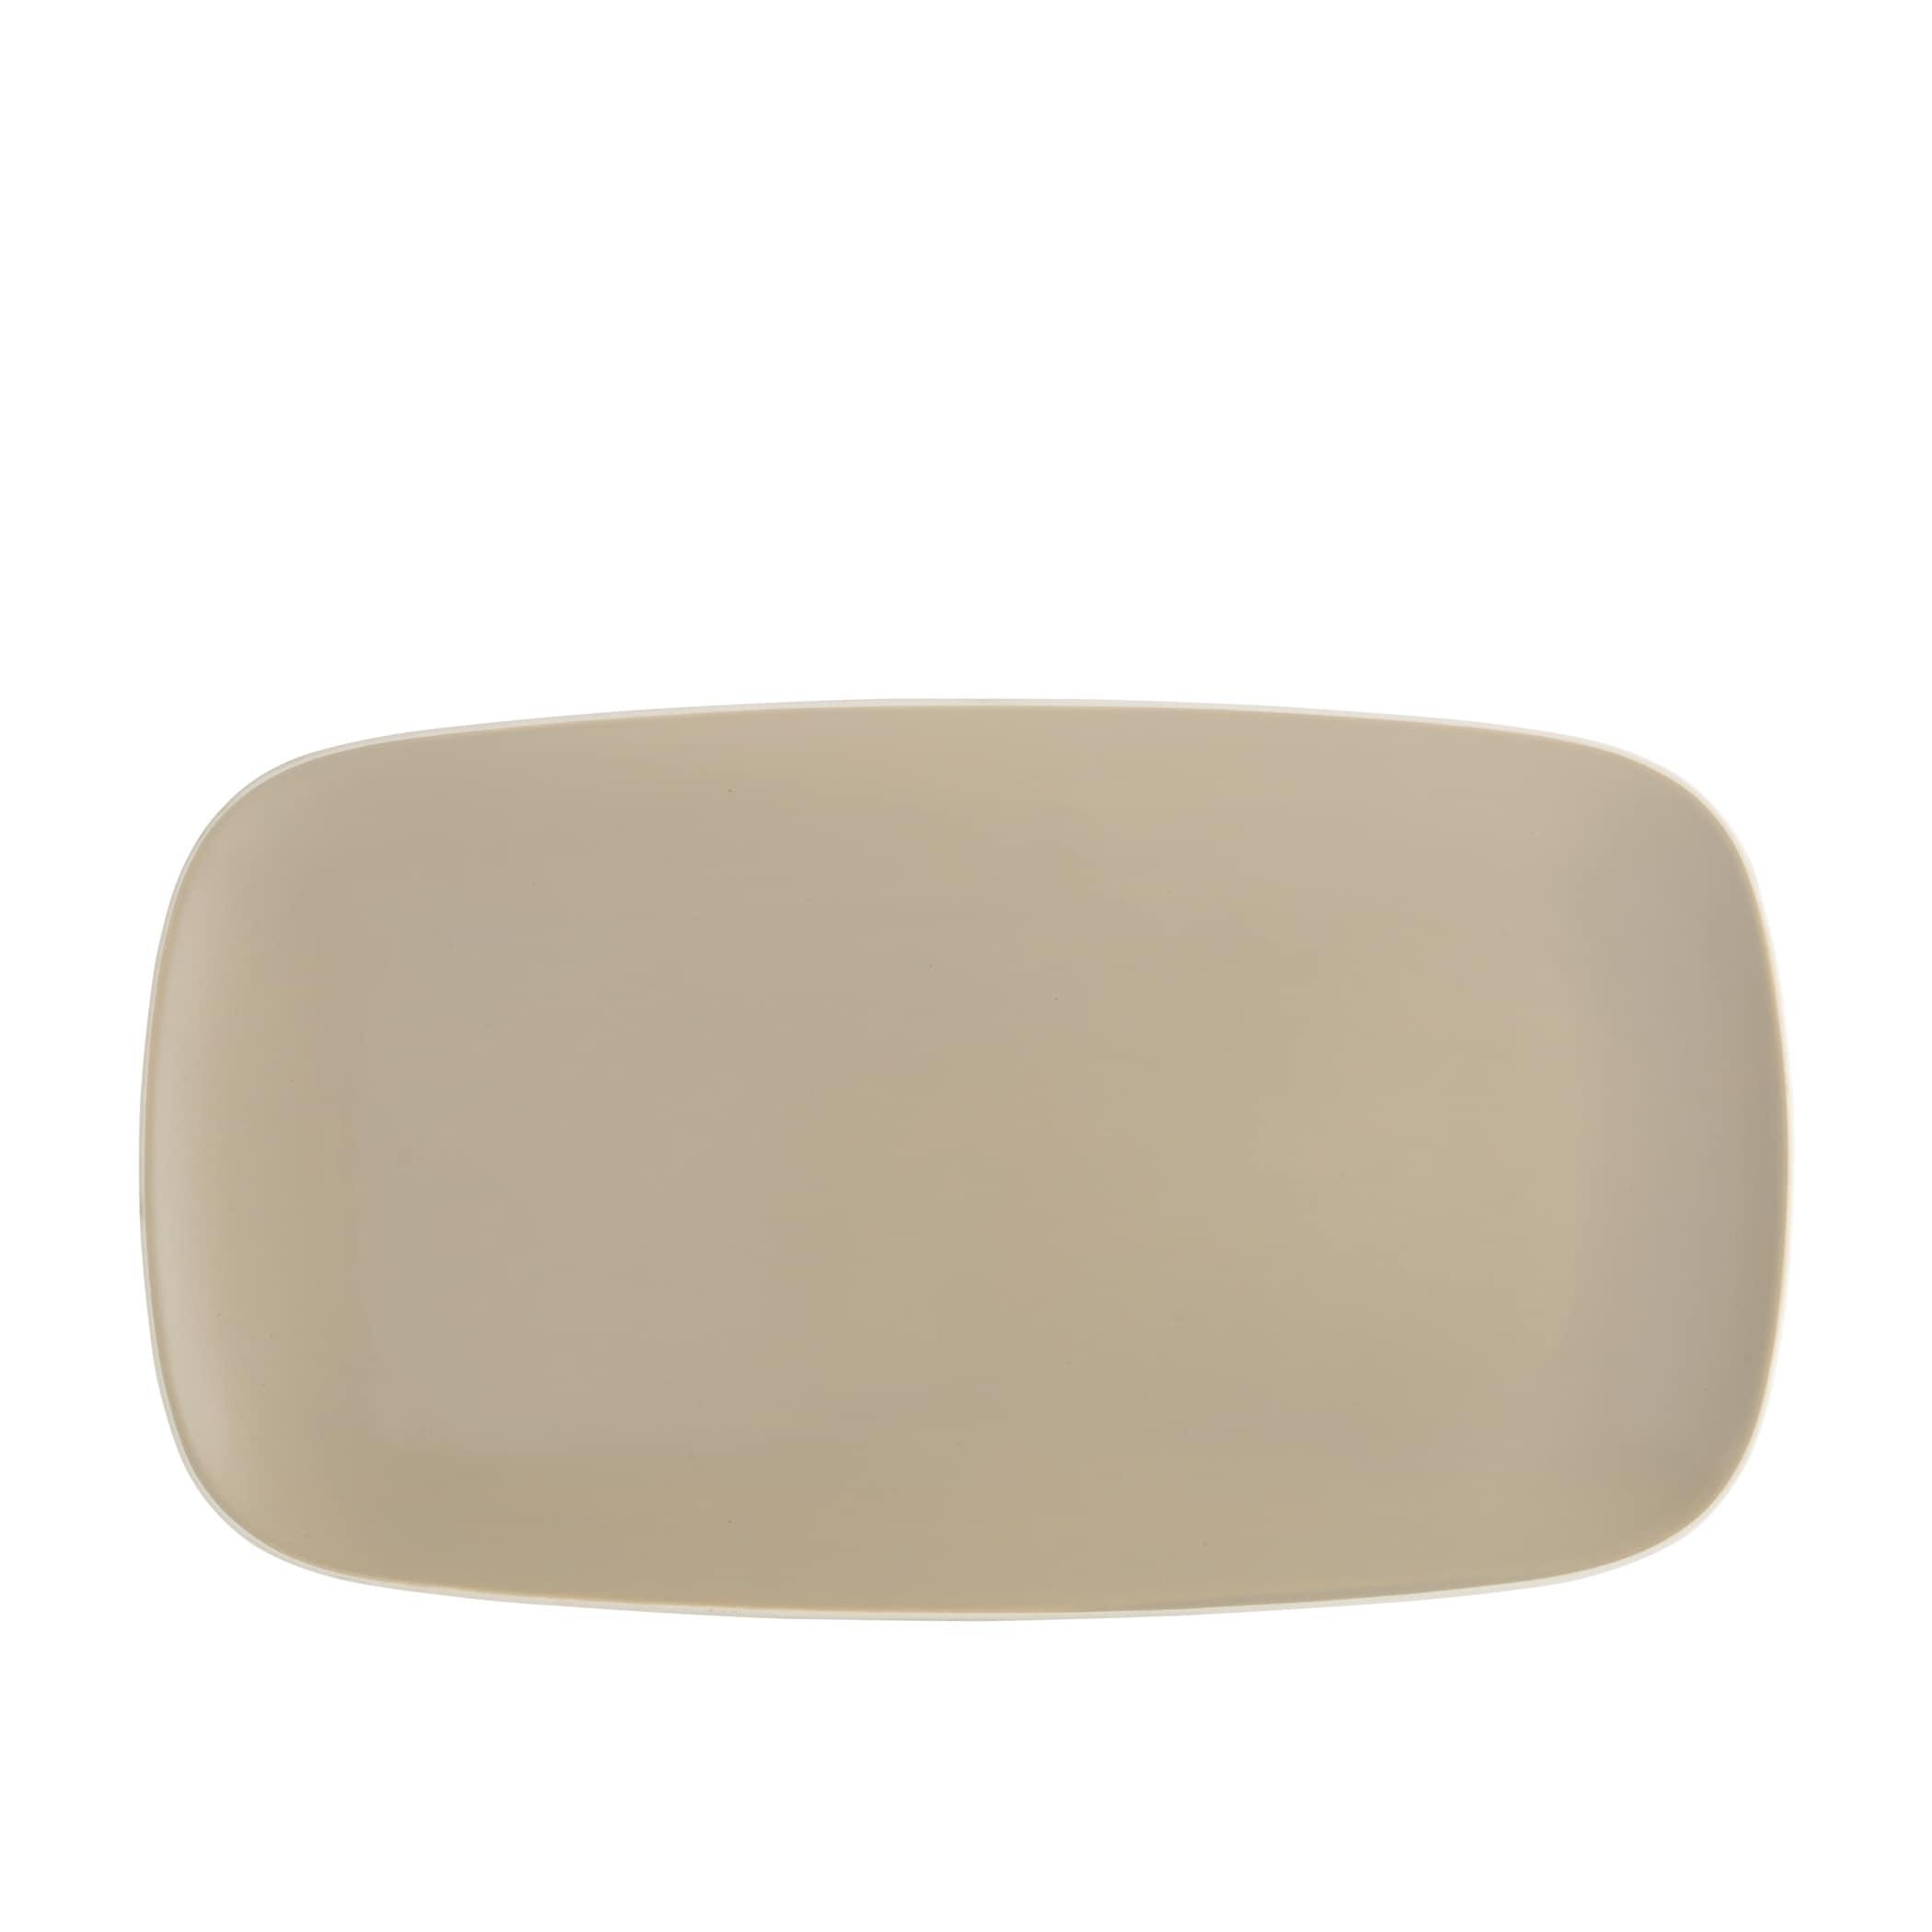 "NEW Godinger Silver Art Natura Large Porcelain Serving Tray 11/"" x 16 1//4/"" /& Rack"